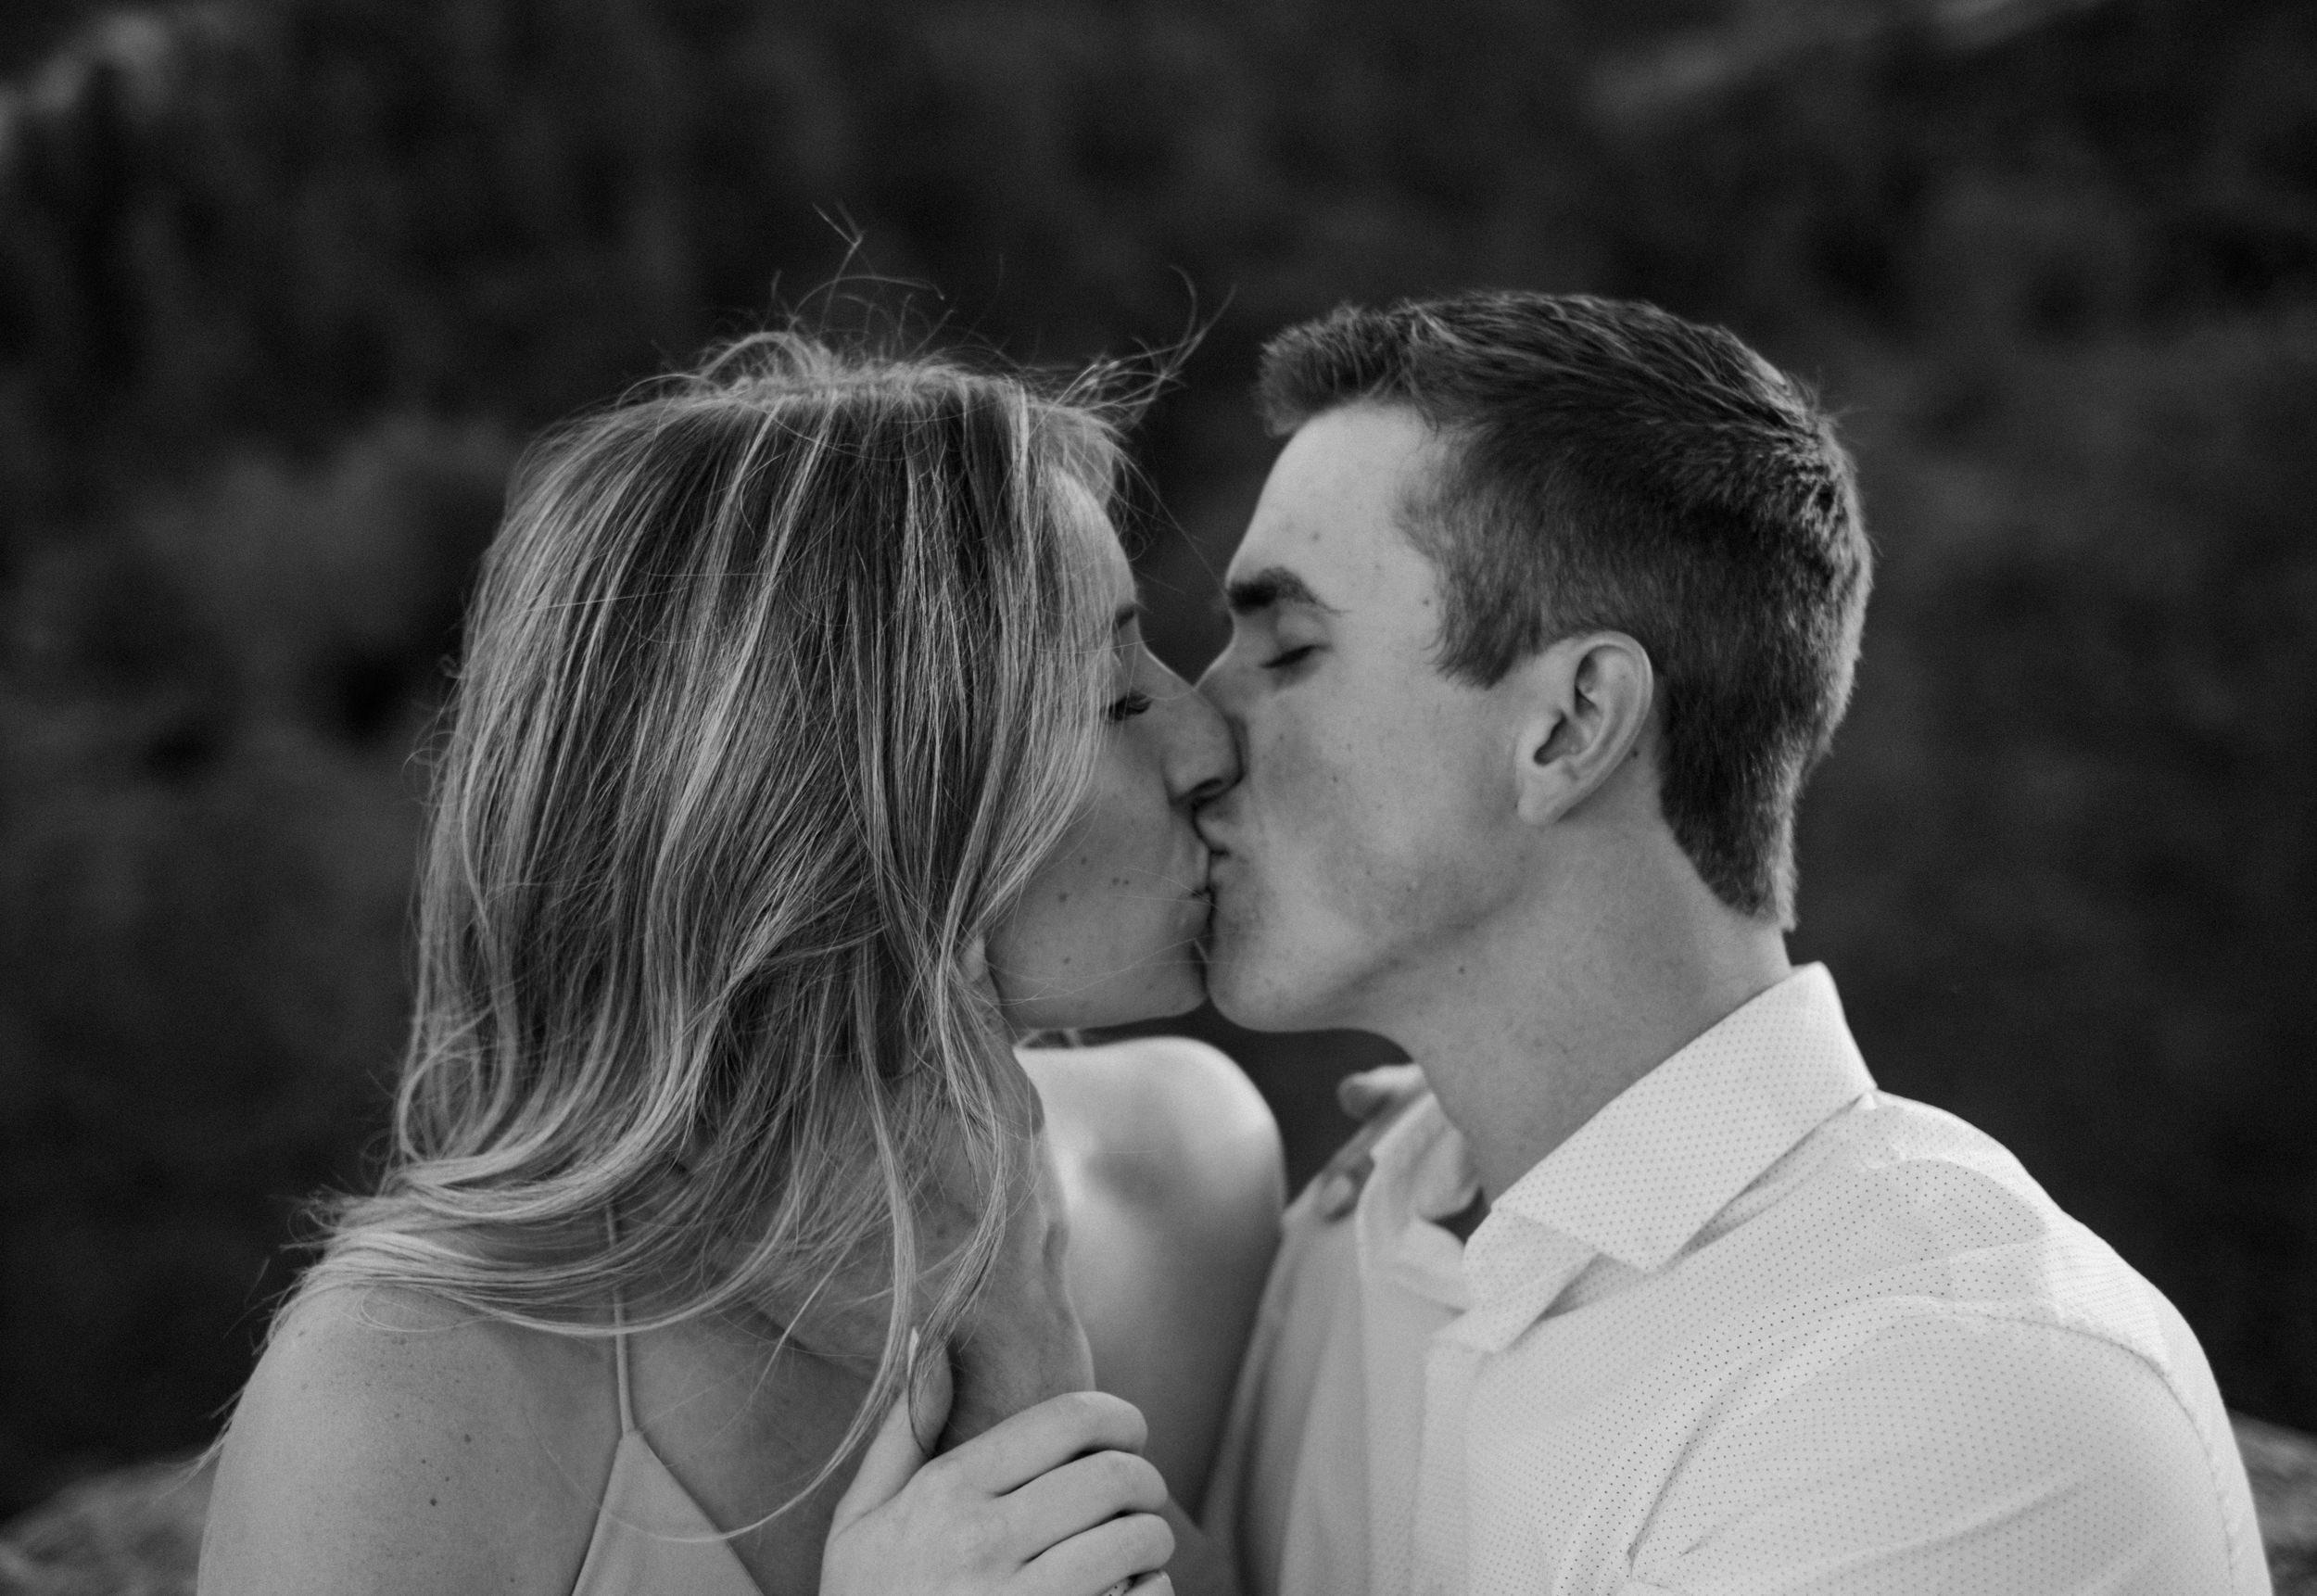 Colorado Springs wedding and engagement photographer. Colorado mountain elopement photography. Garden of the Gods wedding photos.